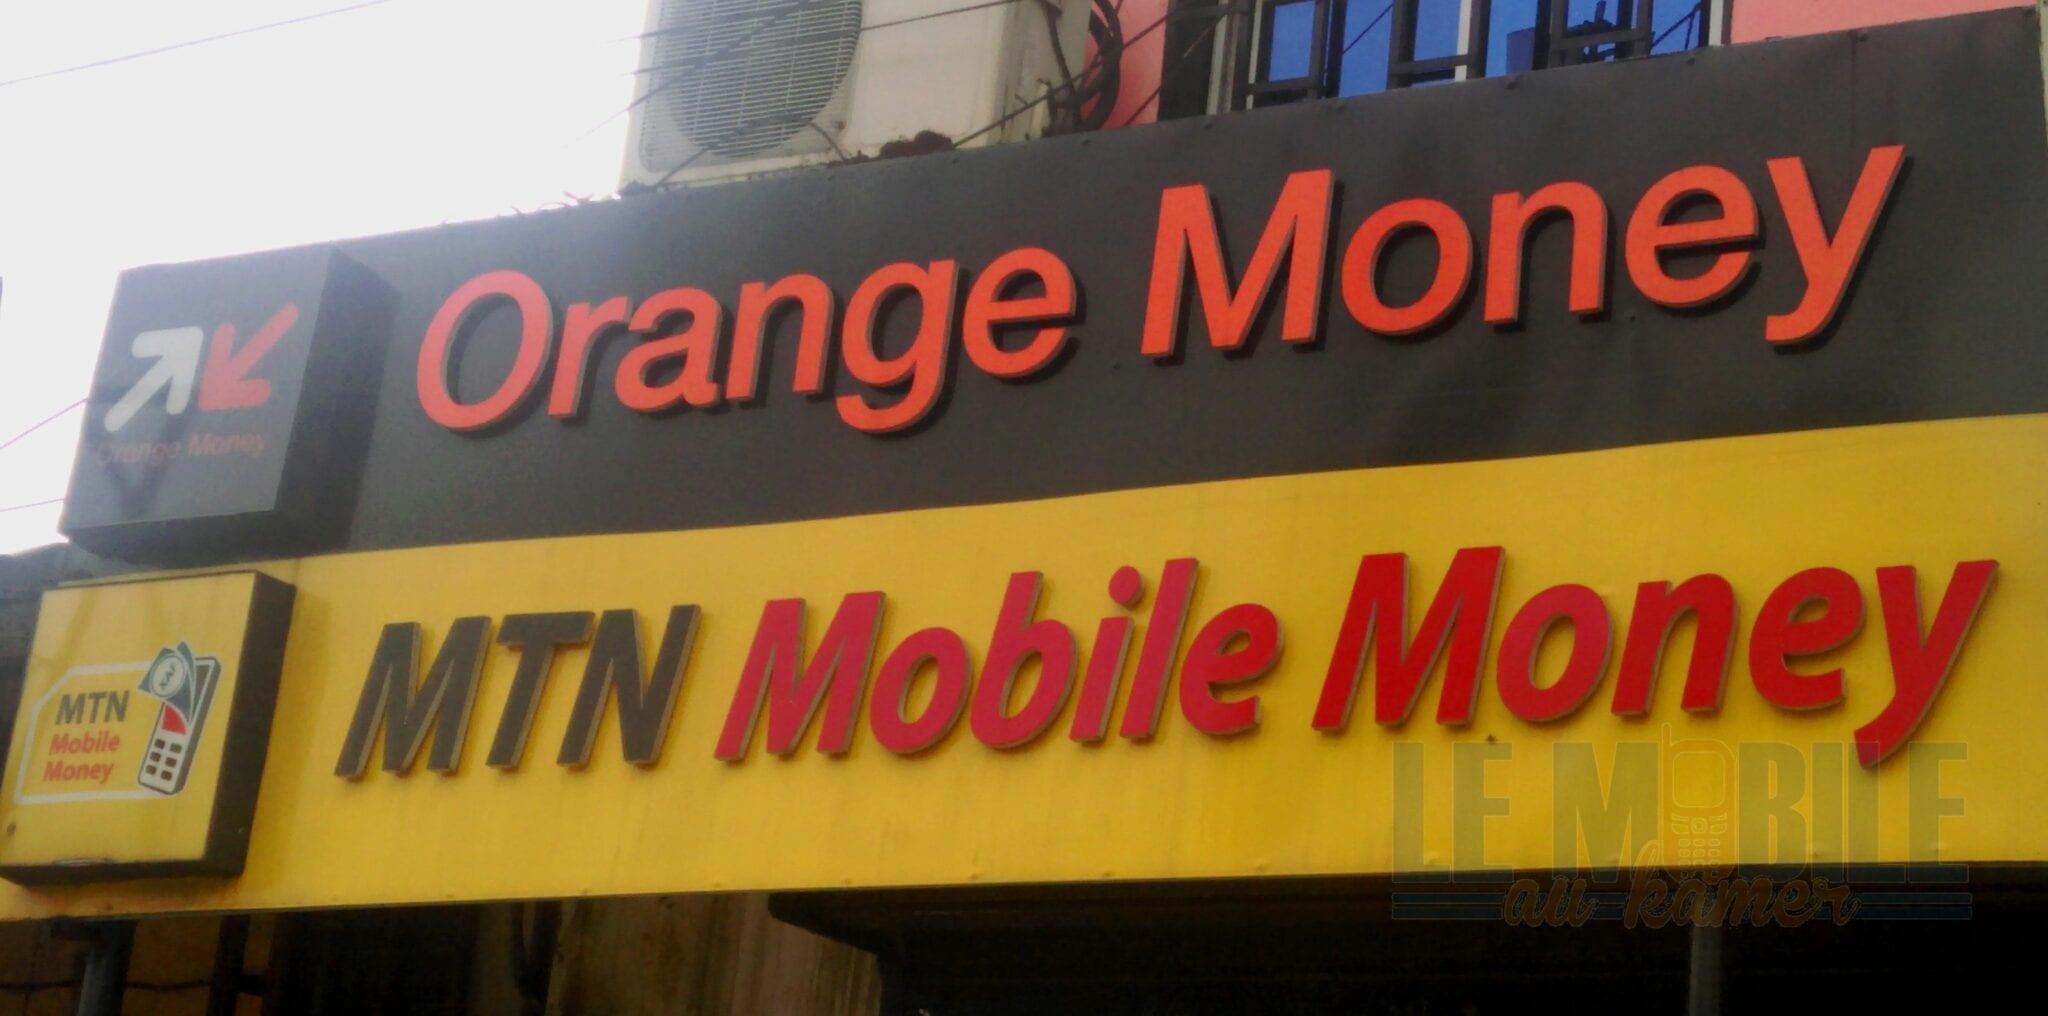 Orange Money Et Mtn Mobile Money Au Cameroun